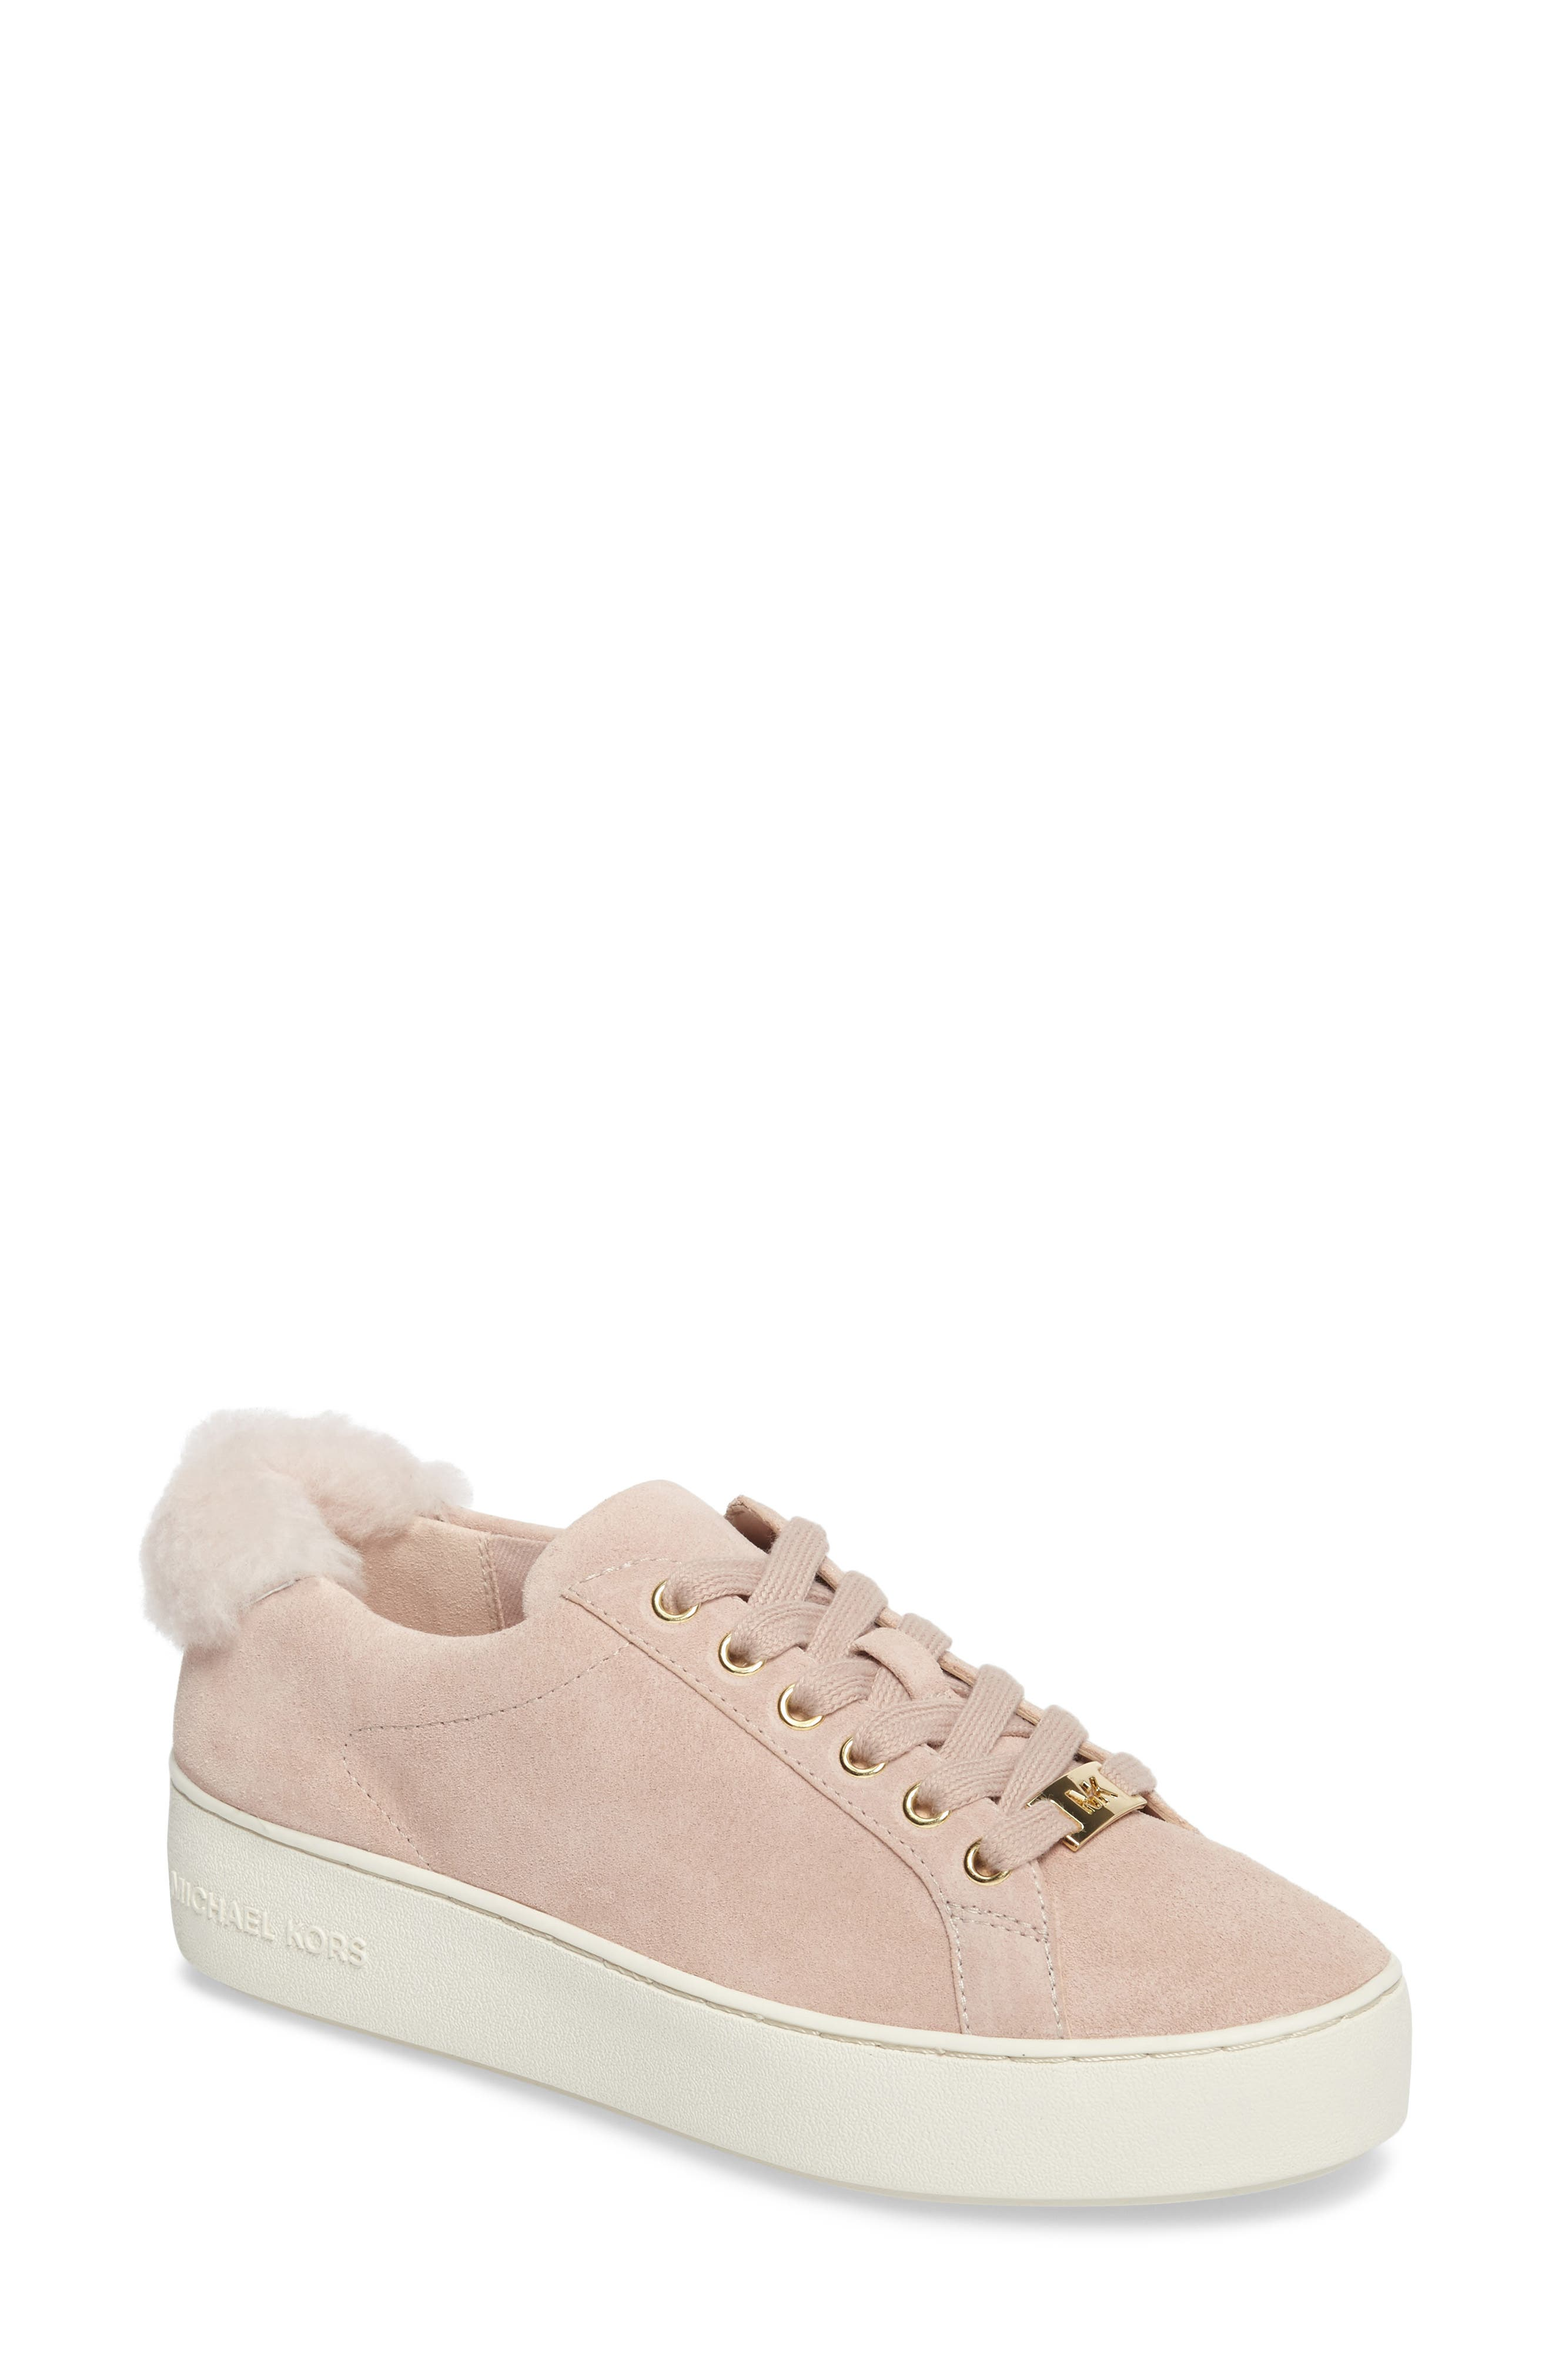 Poppy Platform Sneaker,                             Main thumbnail 1, color,                             651